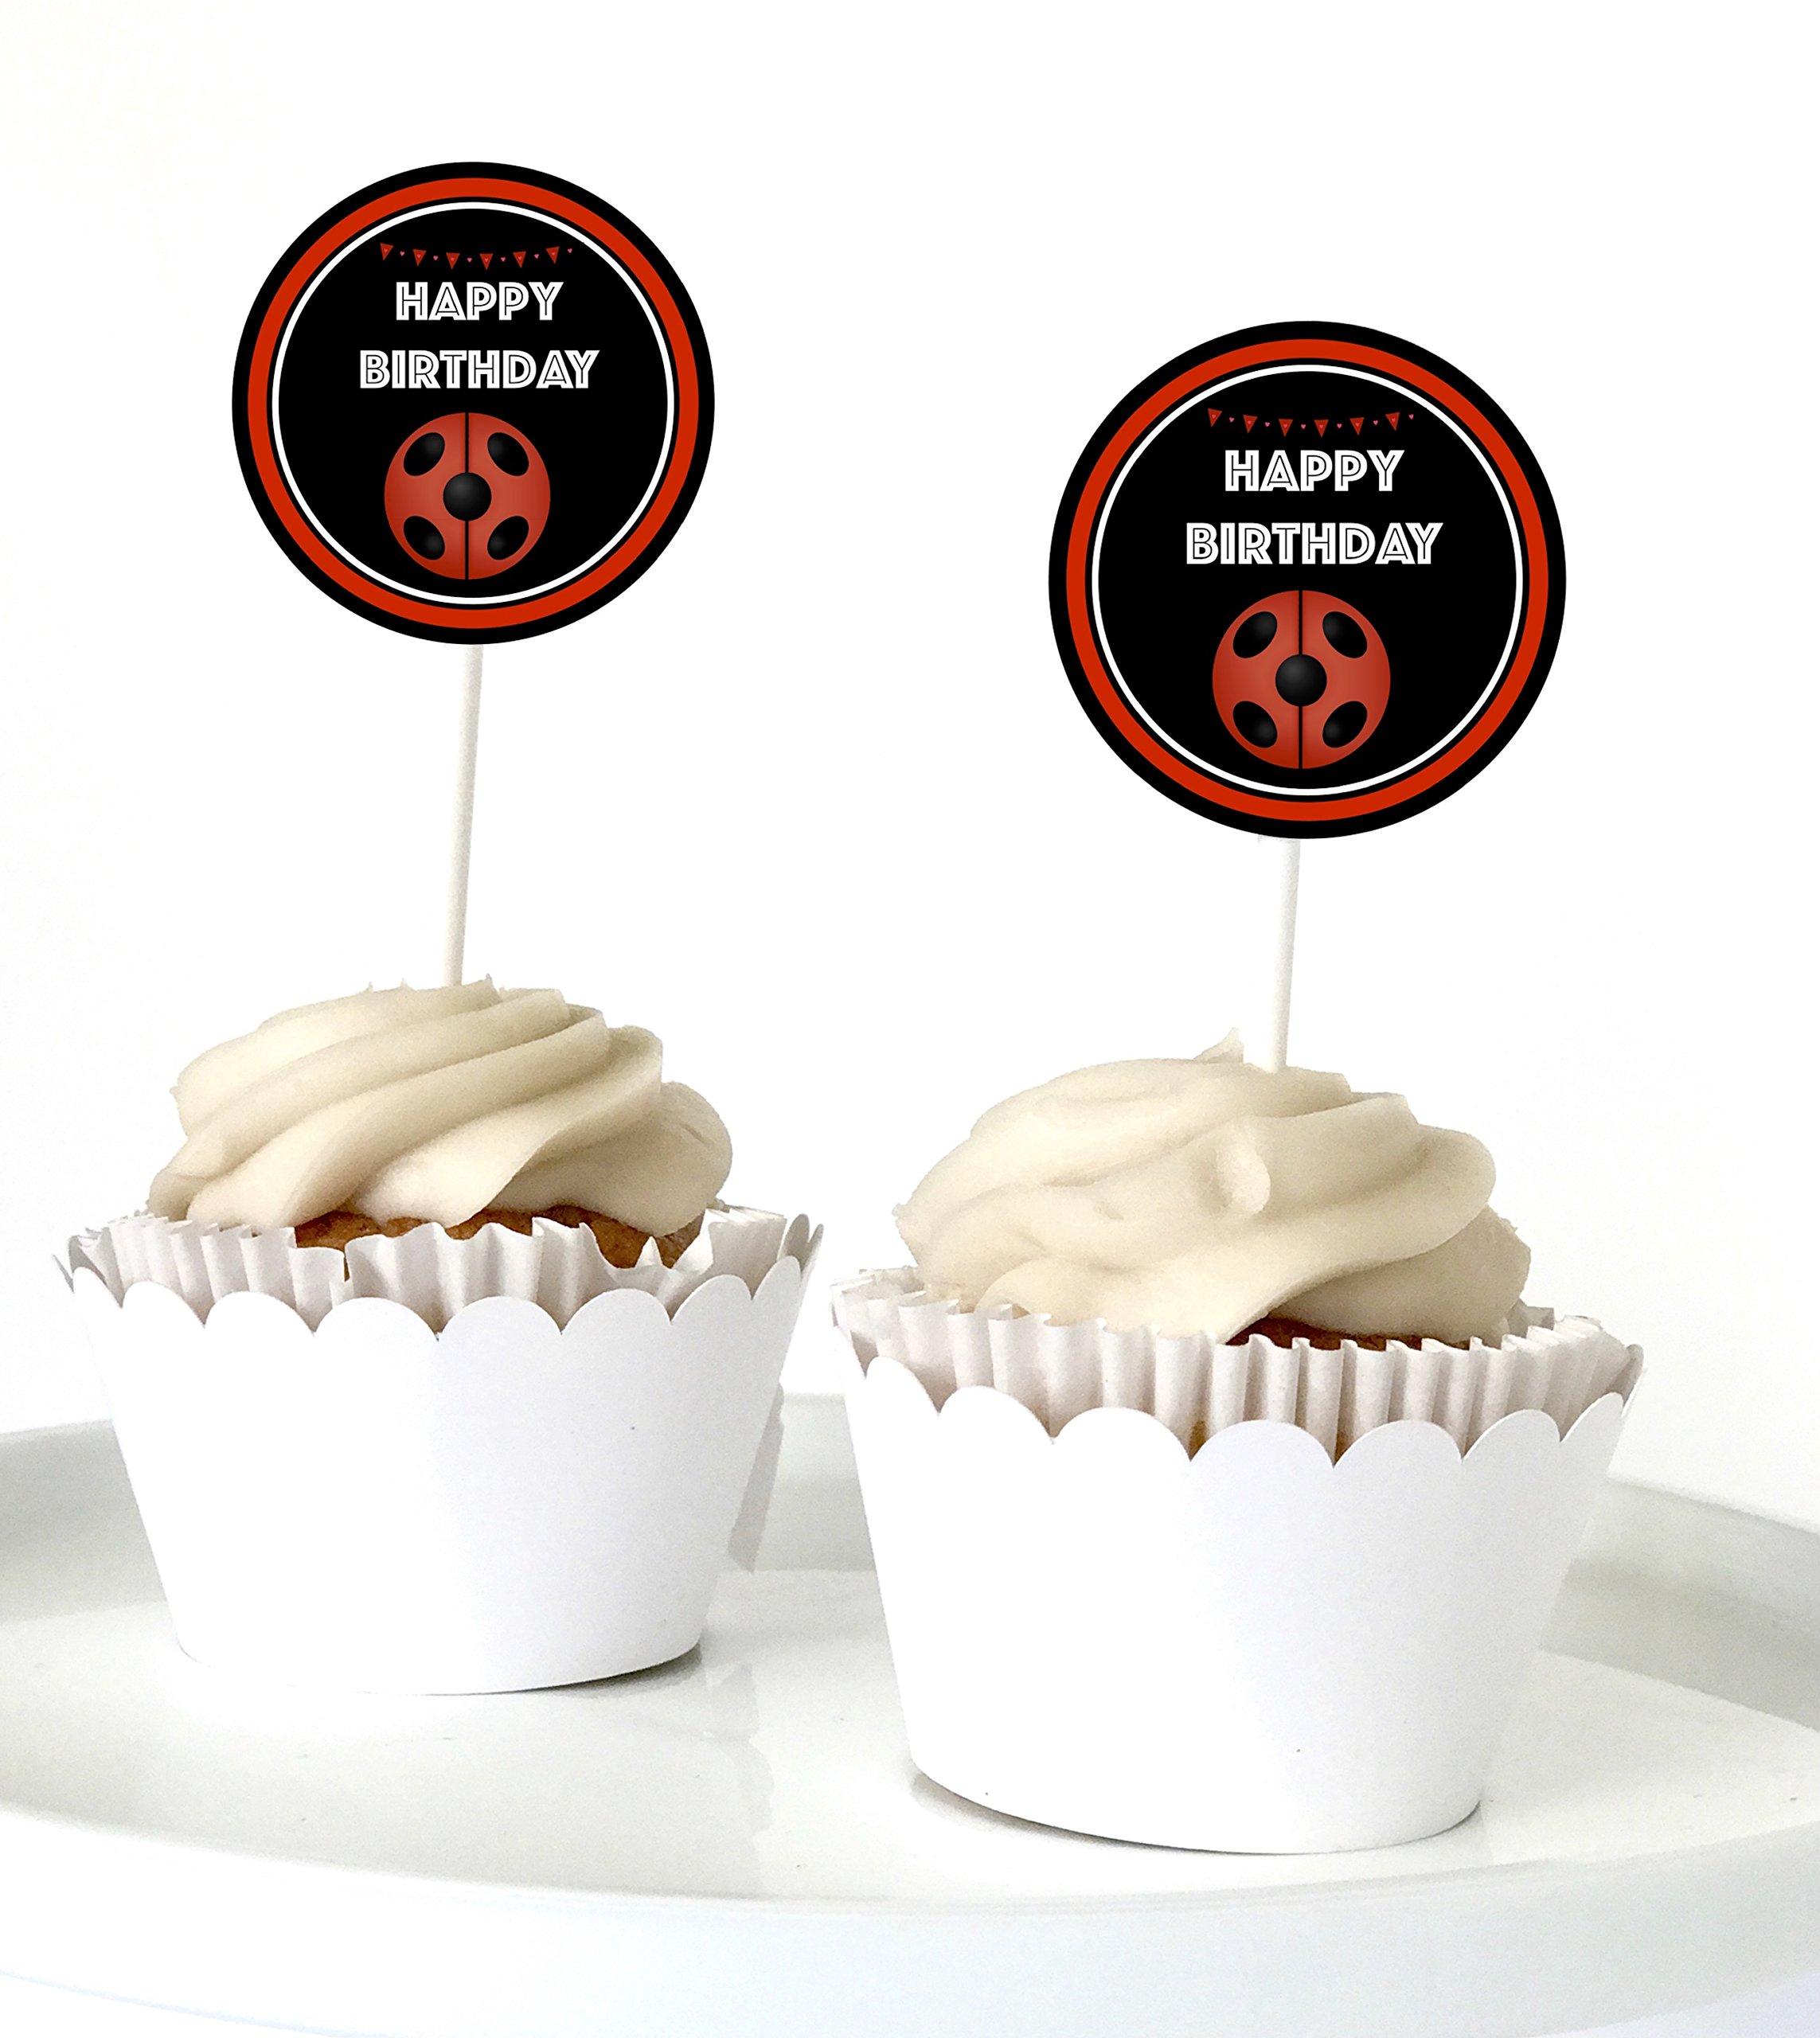 12 Ladybug Cupcake Toppers - Ladybug Party Supplies